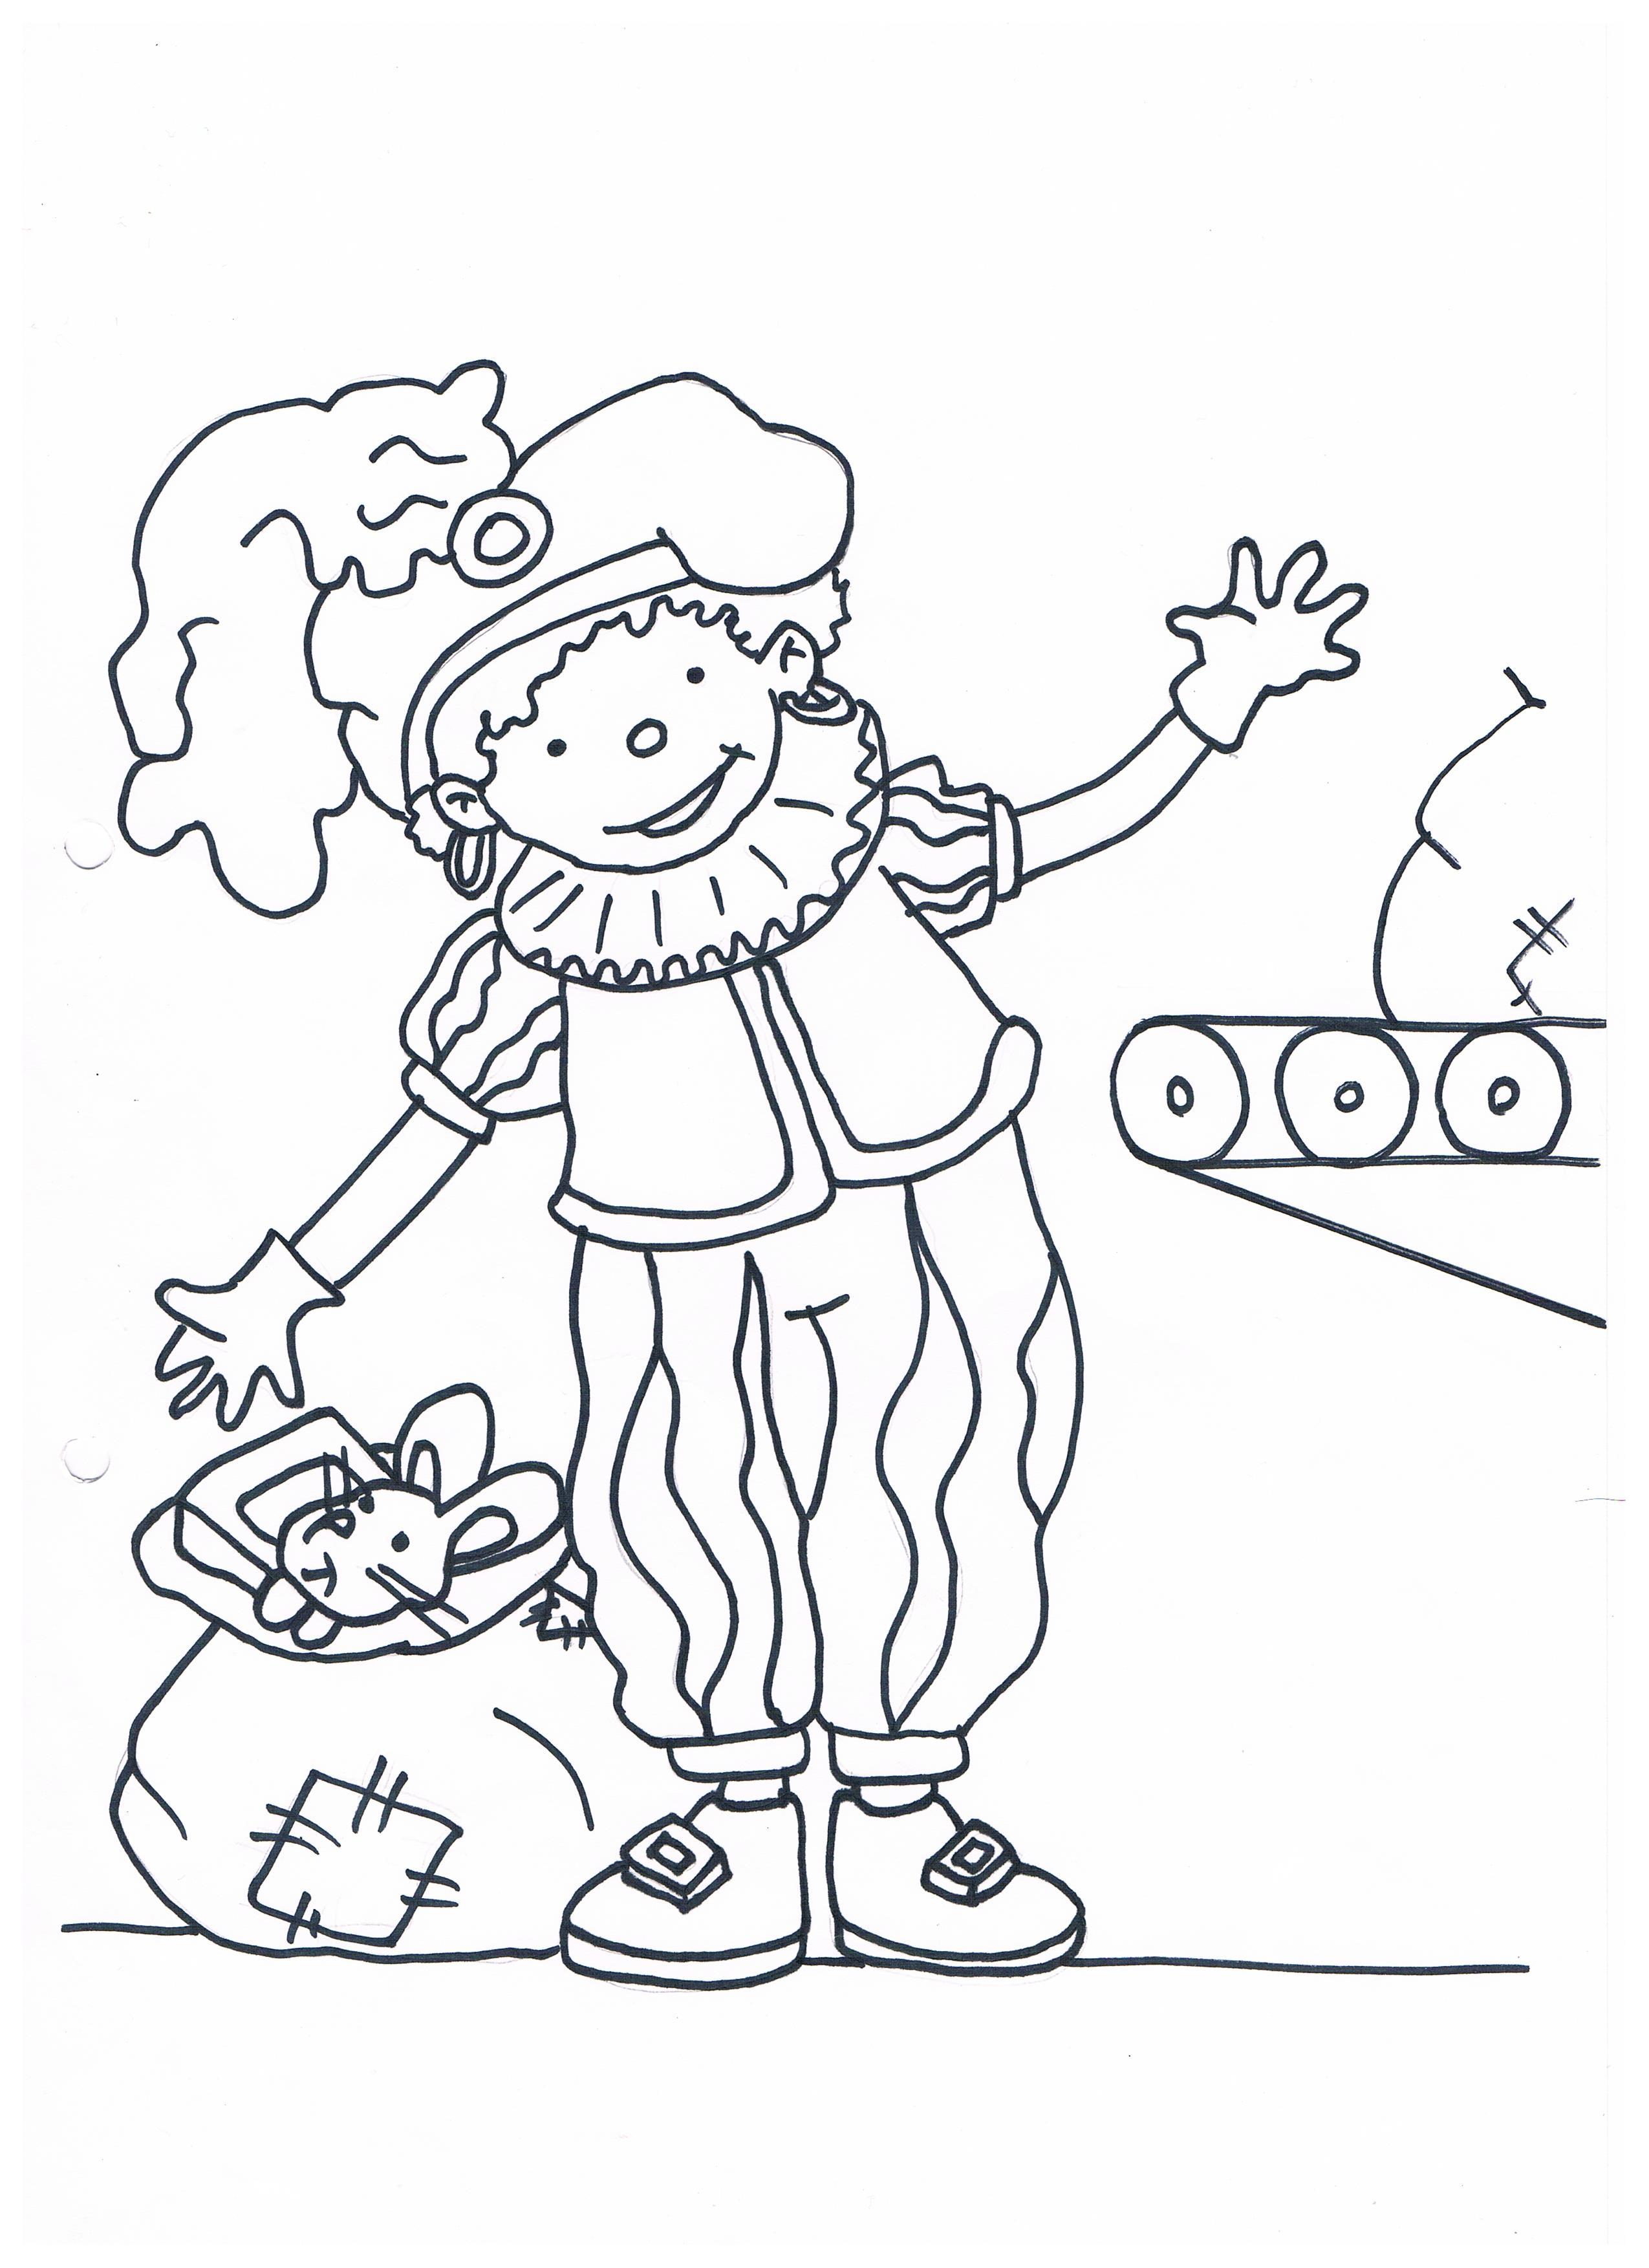 Beau dessin saint nicolas coloriage gratuit - Dessin de saint ...